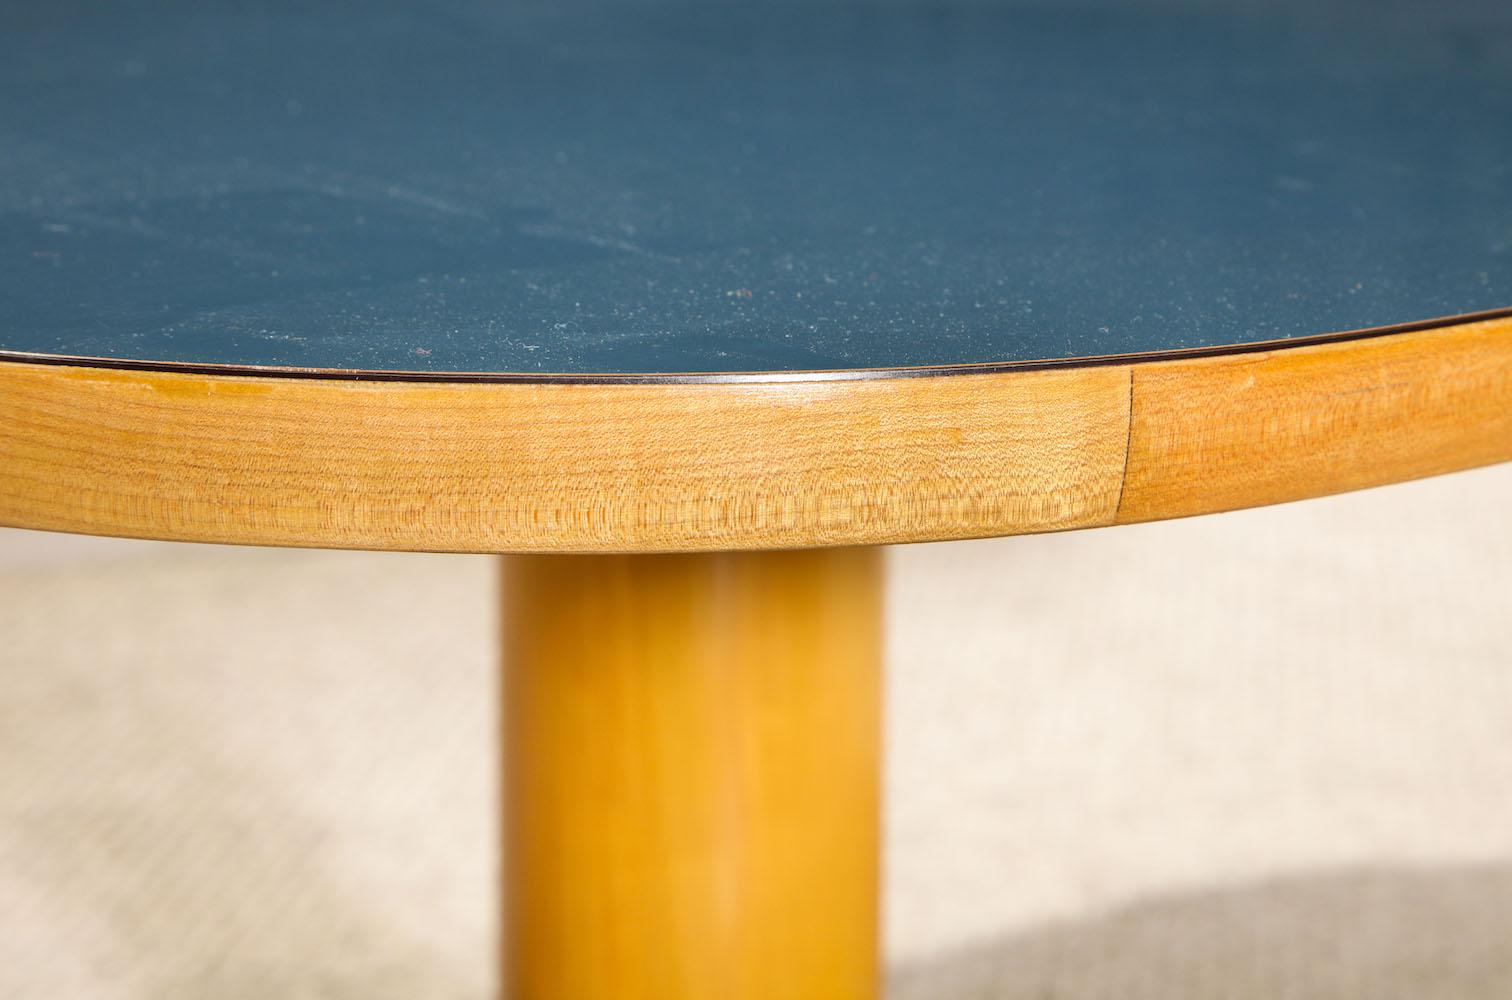 Paul Laszlo Blue Top Table 2.jpg